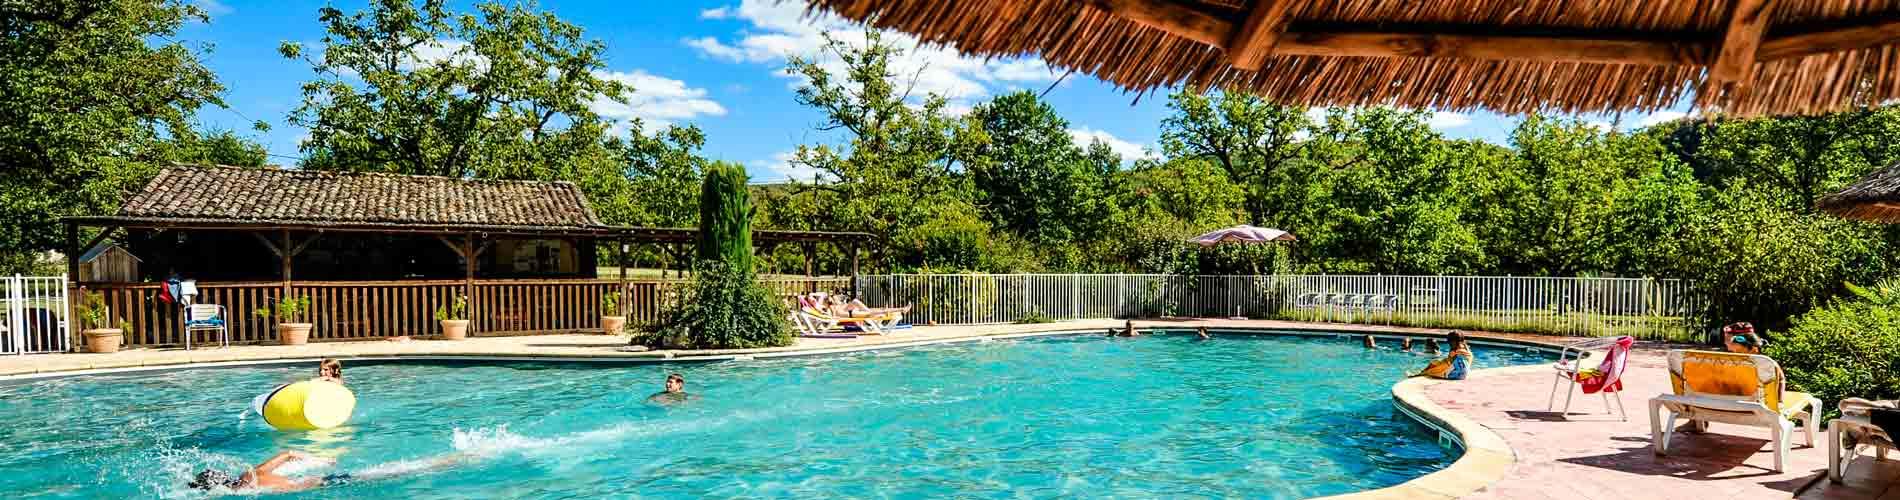 Camping lot avec piscine camping avec espace quatique for Camping fouesnant avec piscine